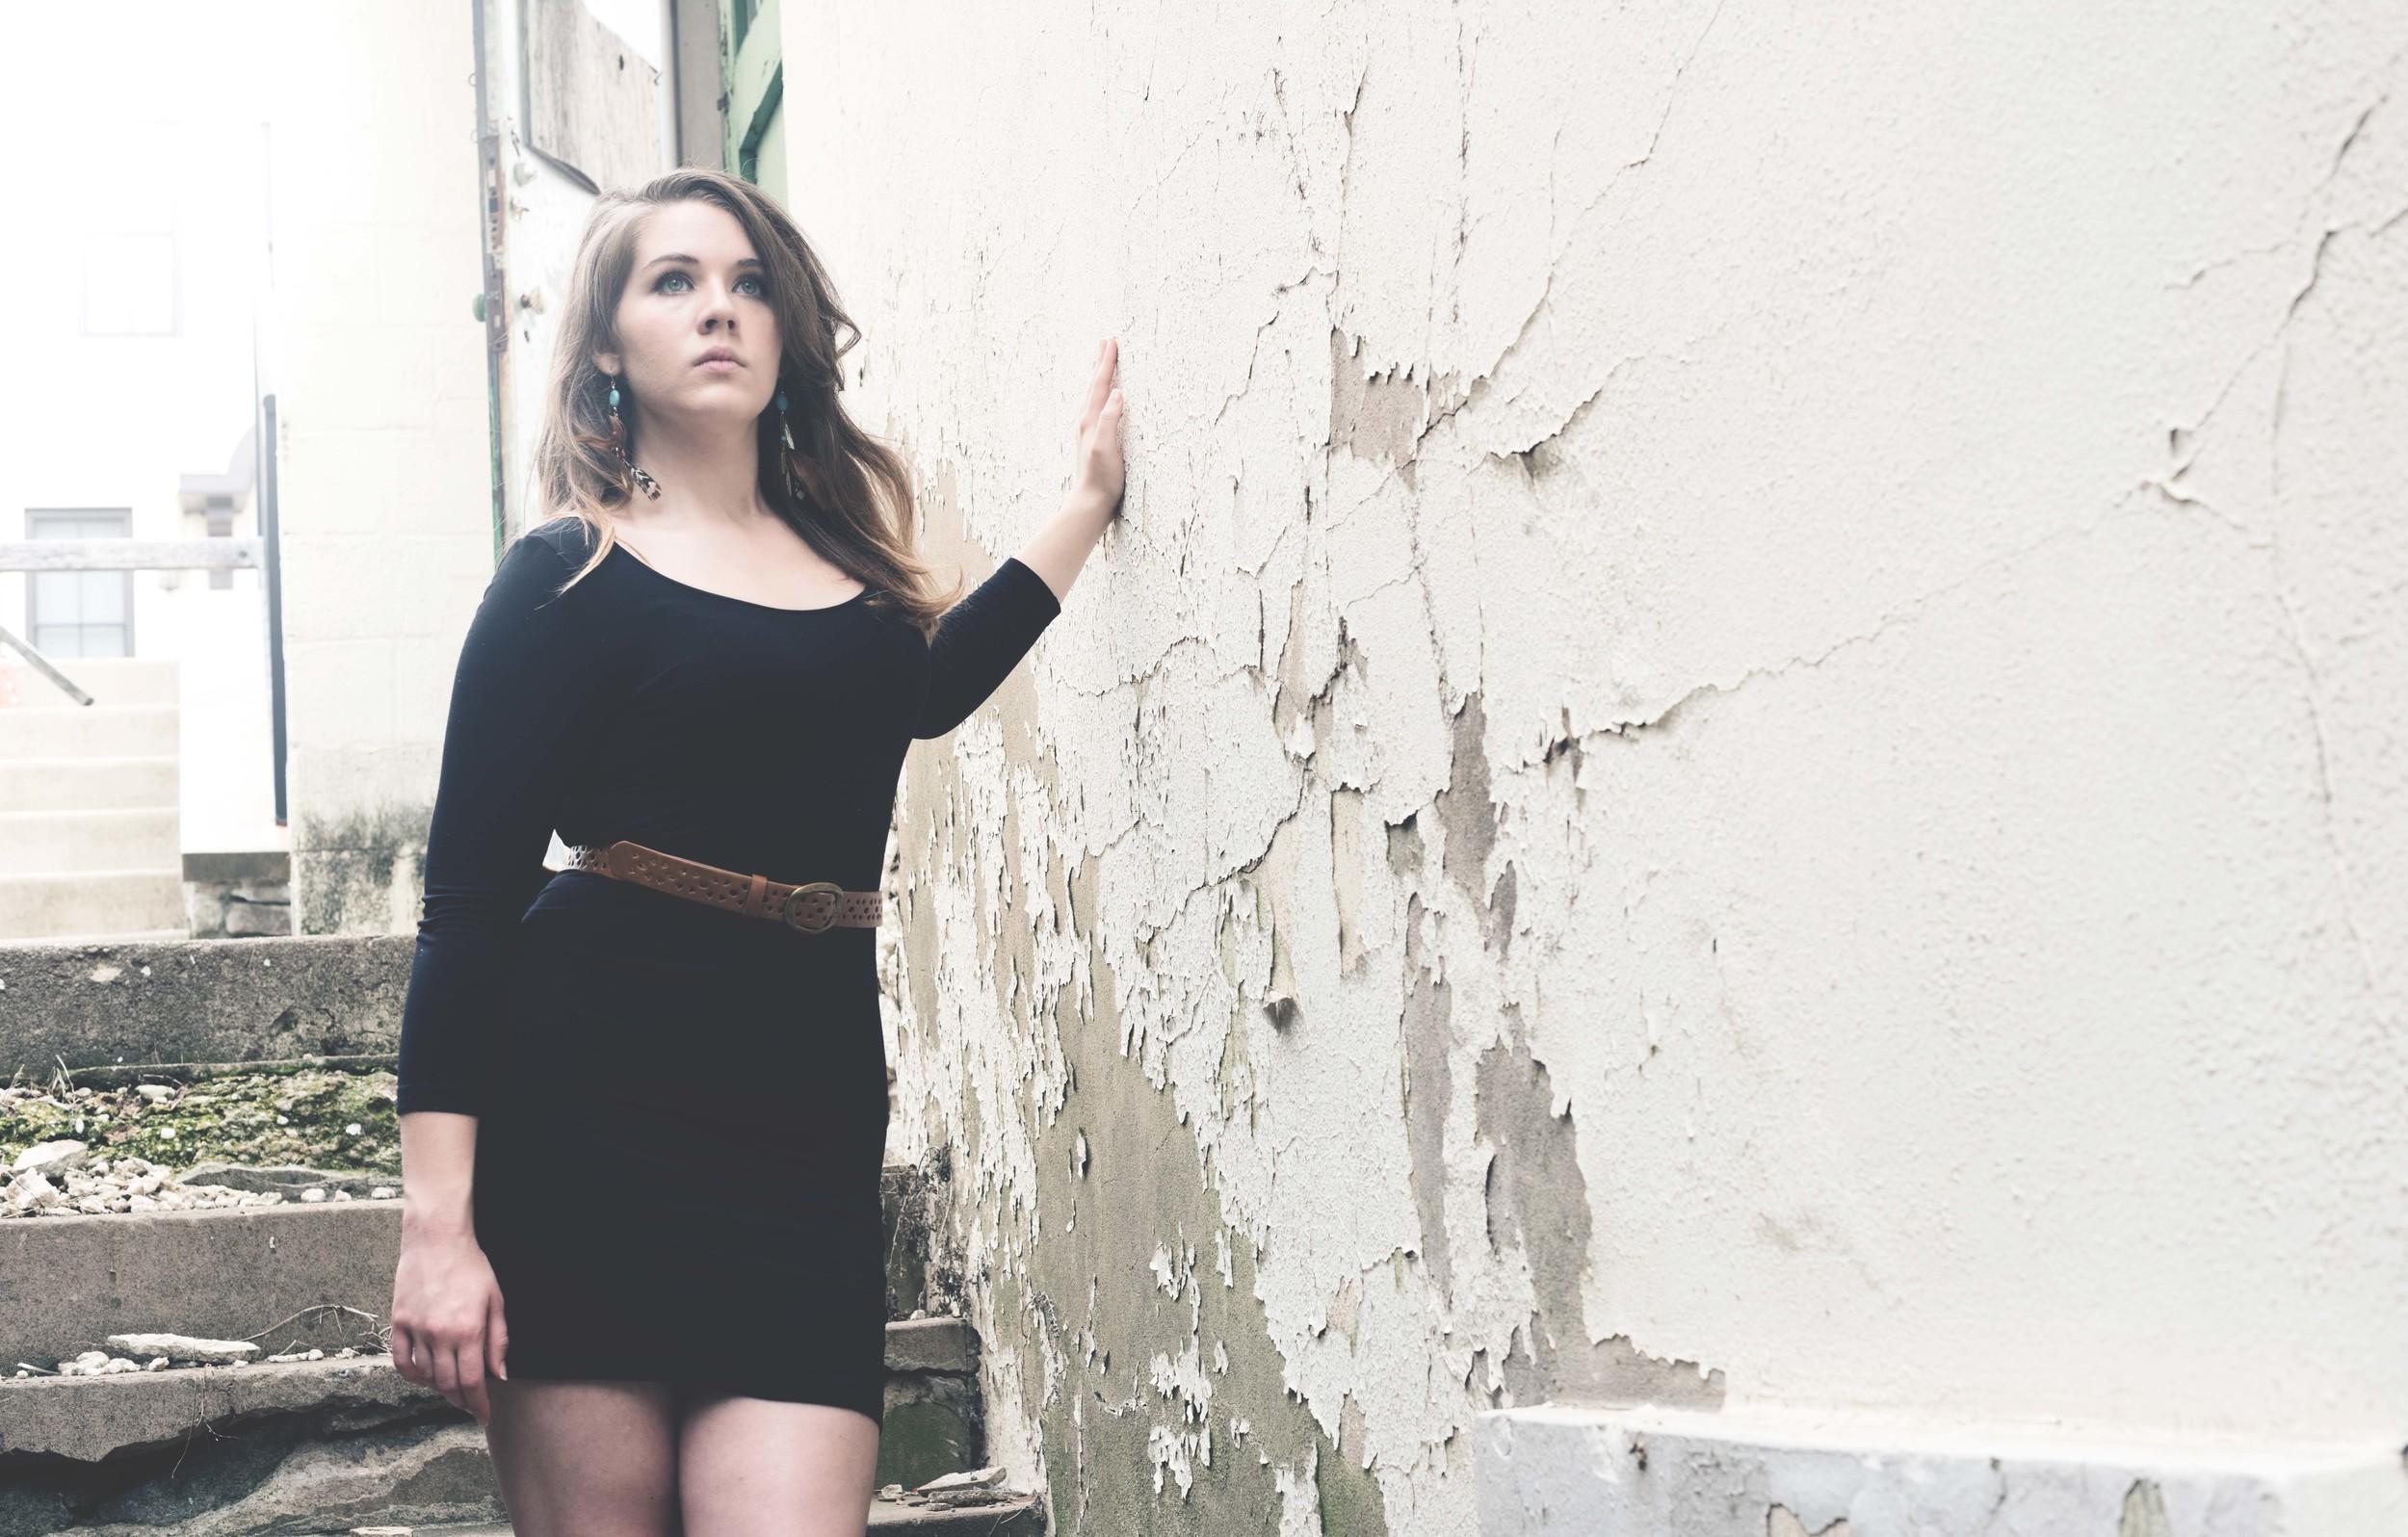 Samantha-Killbride-5